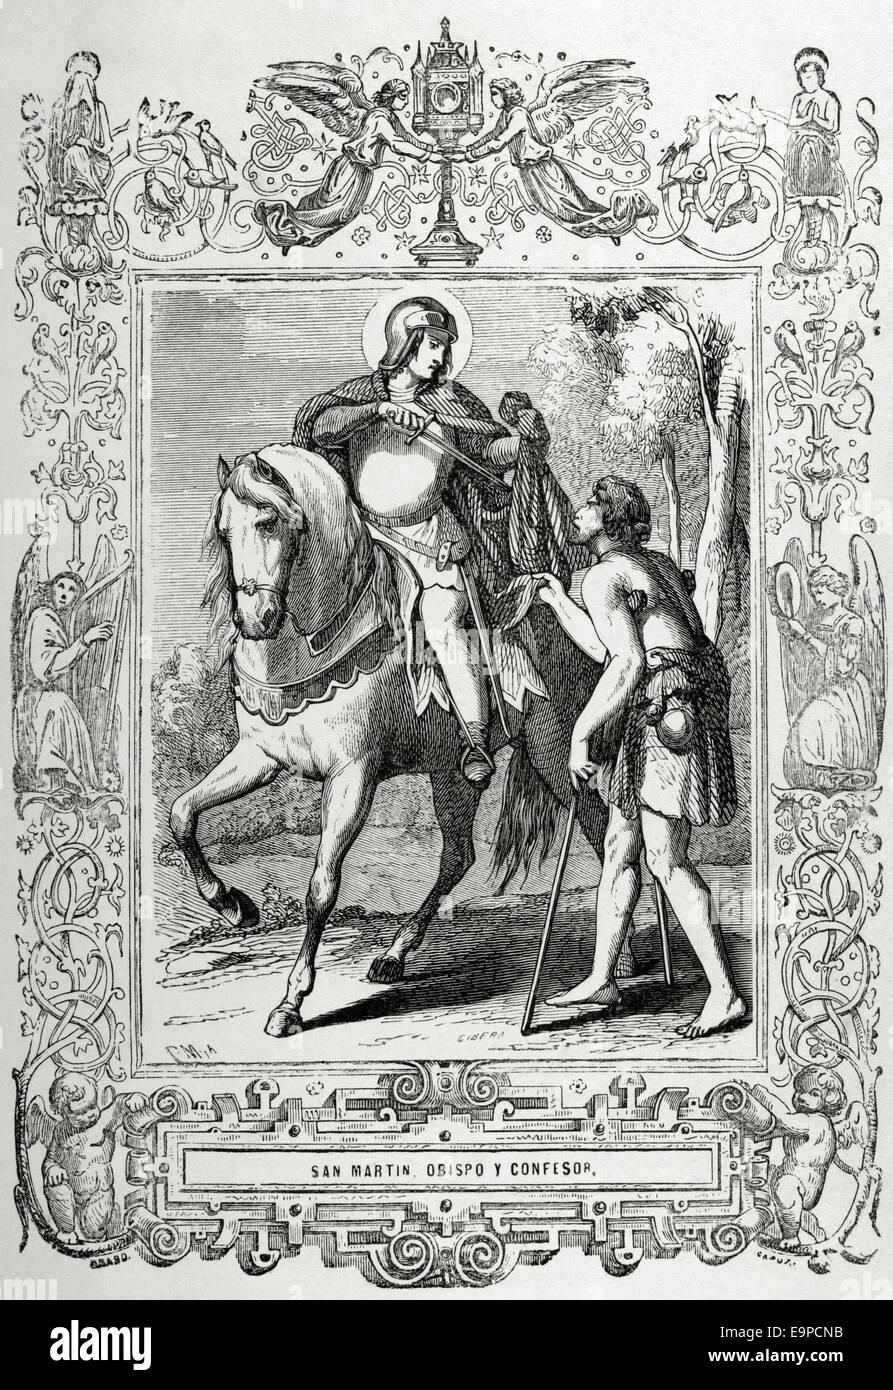 Saint Martin of Braga (520-580) sharing his cloak with a beggar. Engraving. - Stock Image